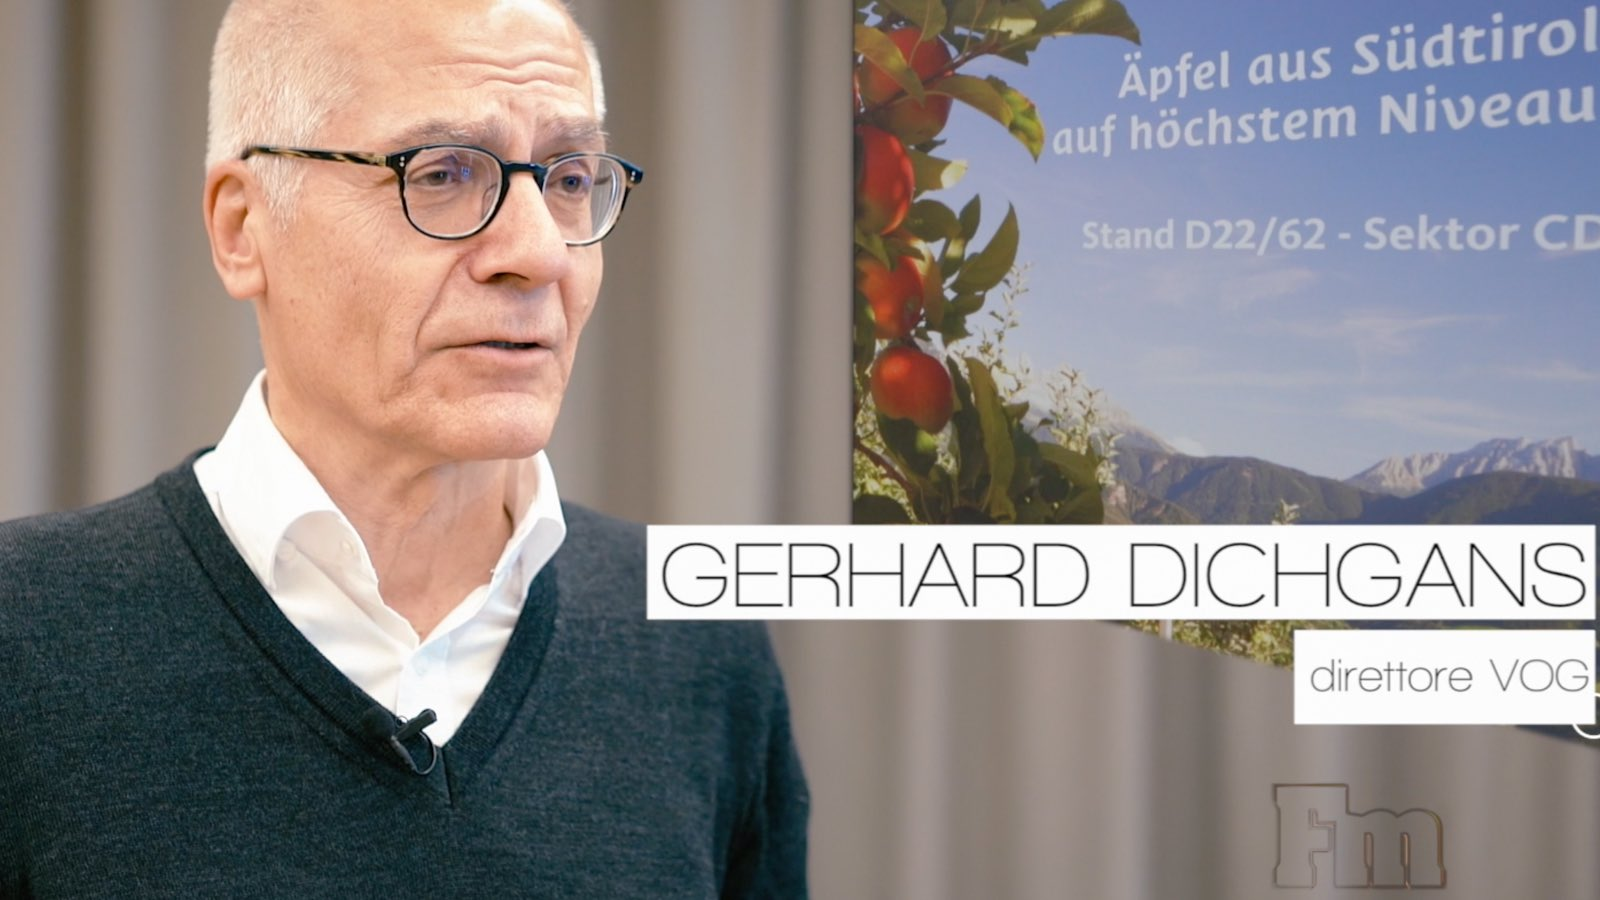 Gerhard-Dichgans-VOG-Interpoma-Fm-2018